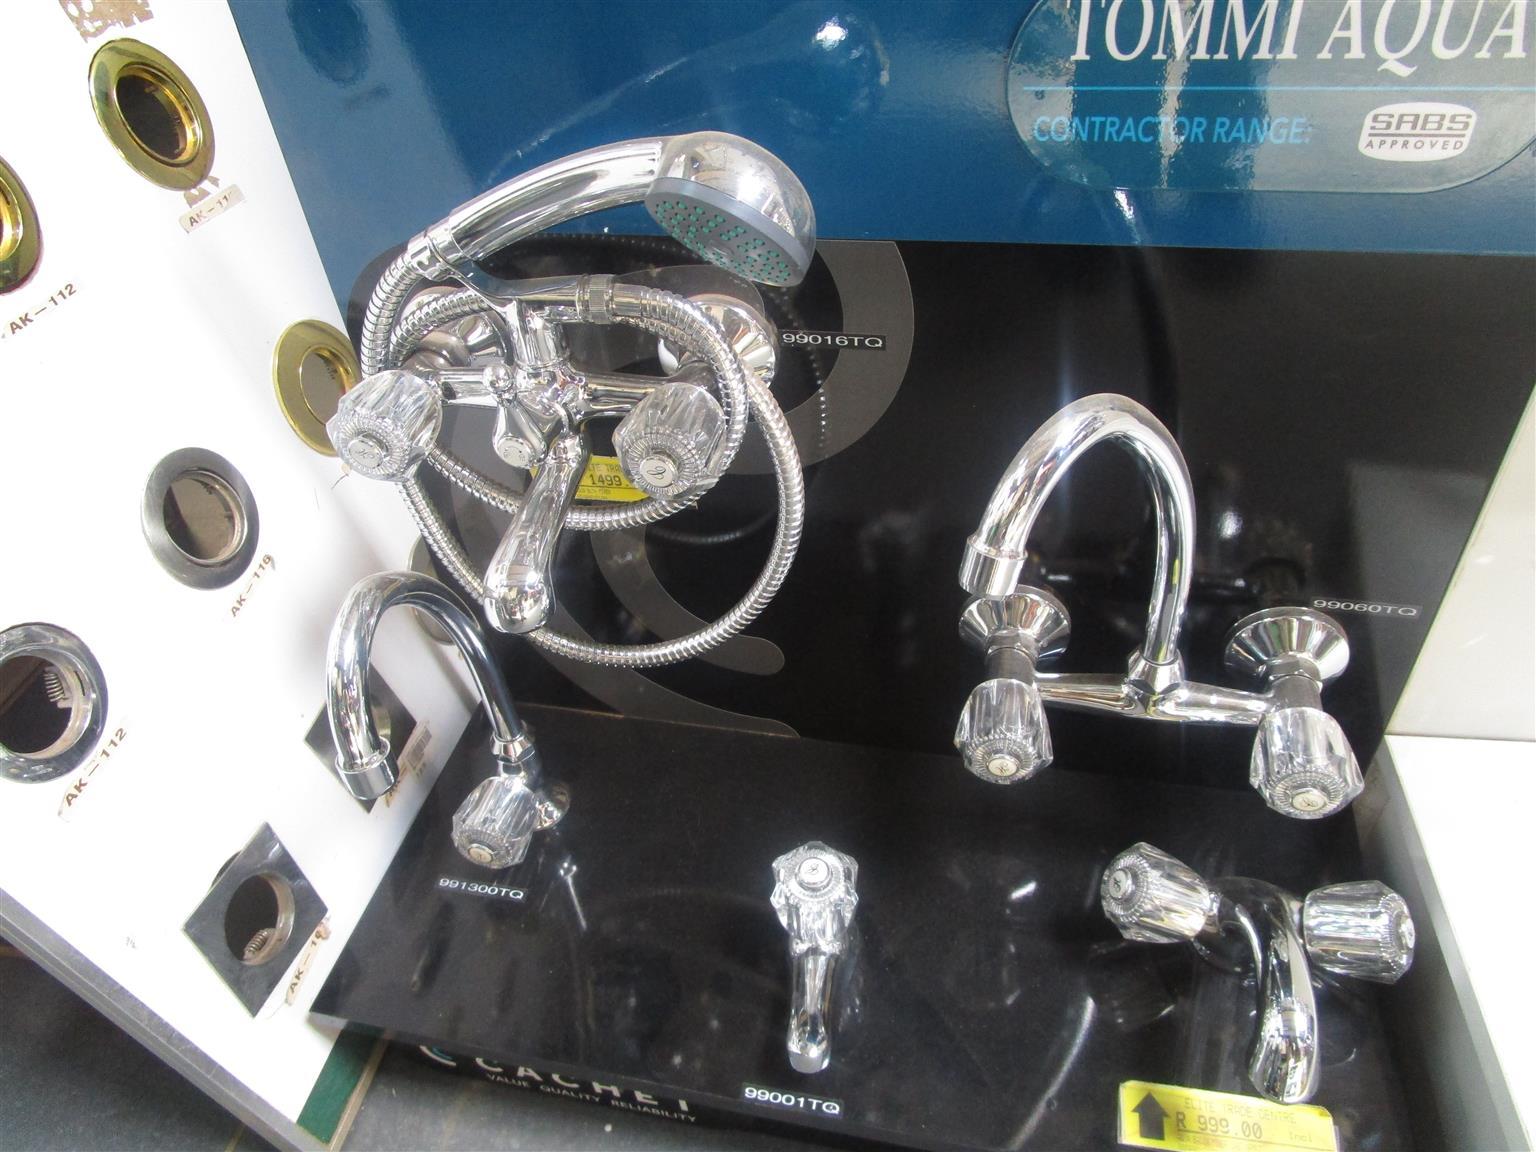 Variety of taps